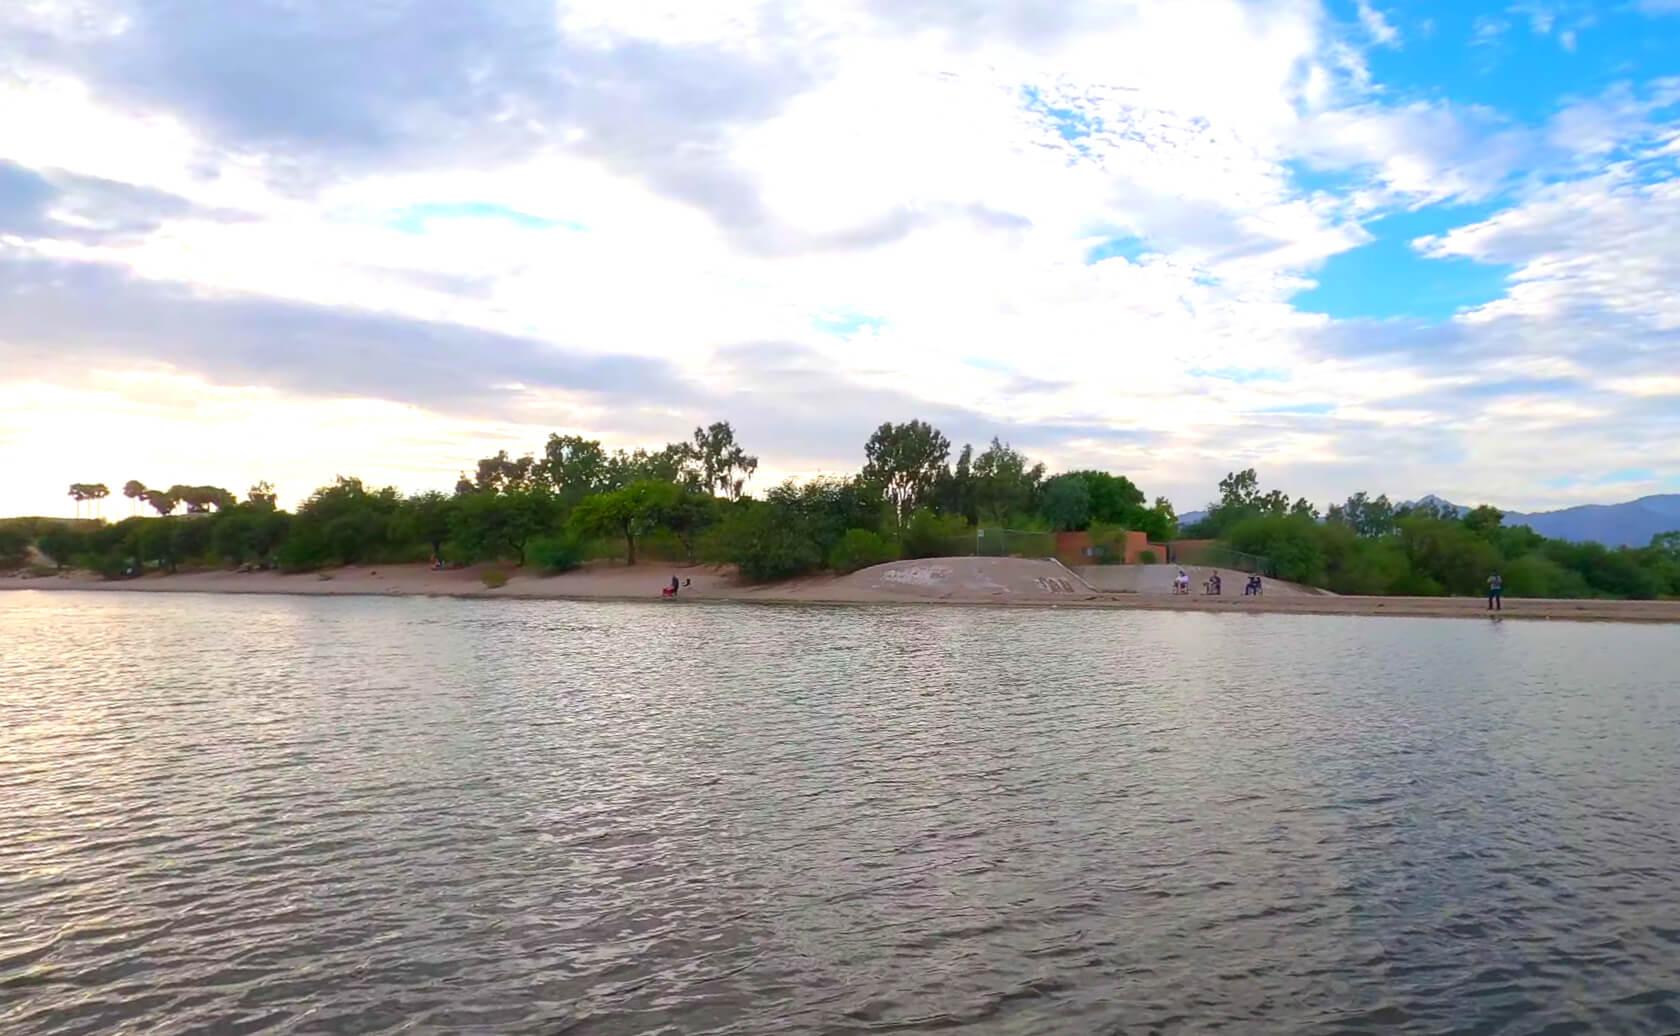 Lakeside-Lake-Fishing-Guide-Tucson-AZ-02